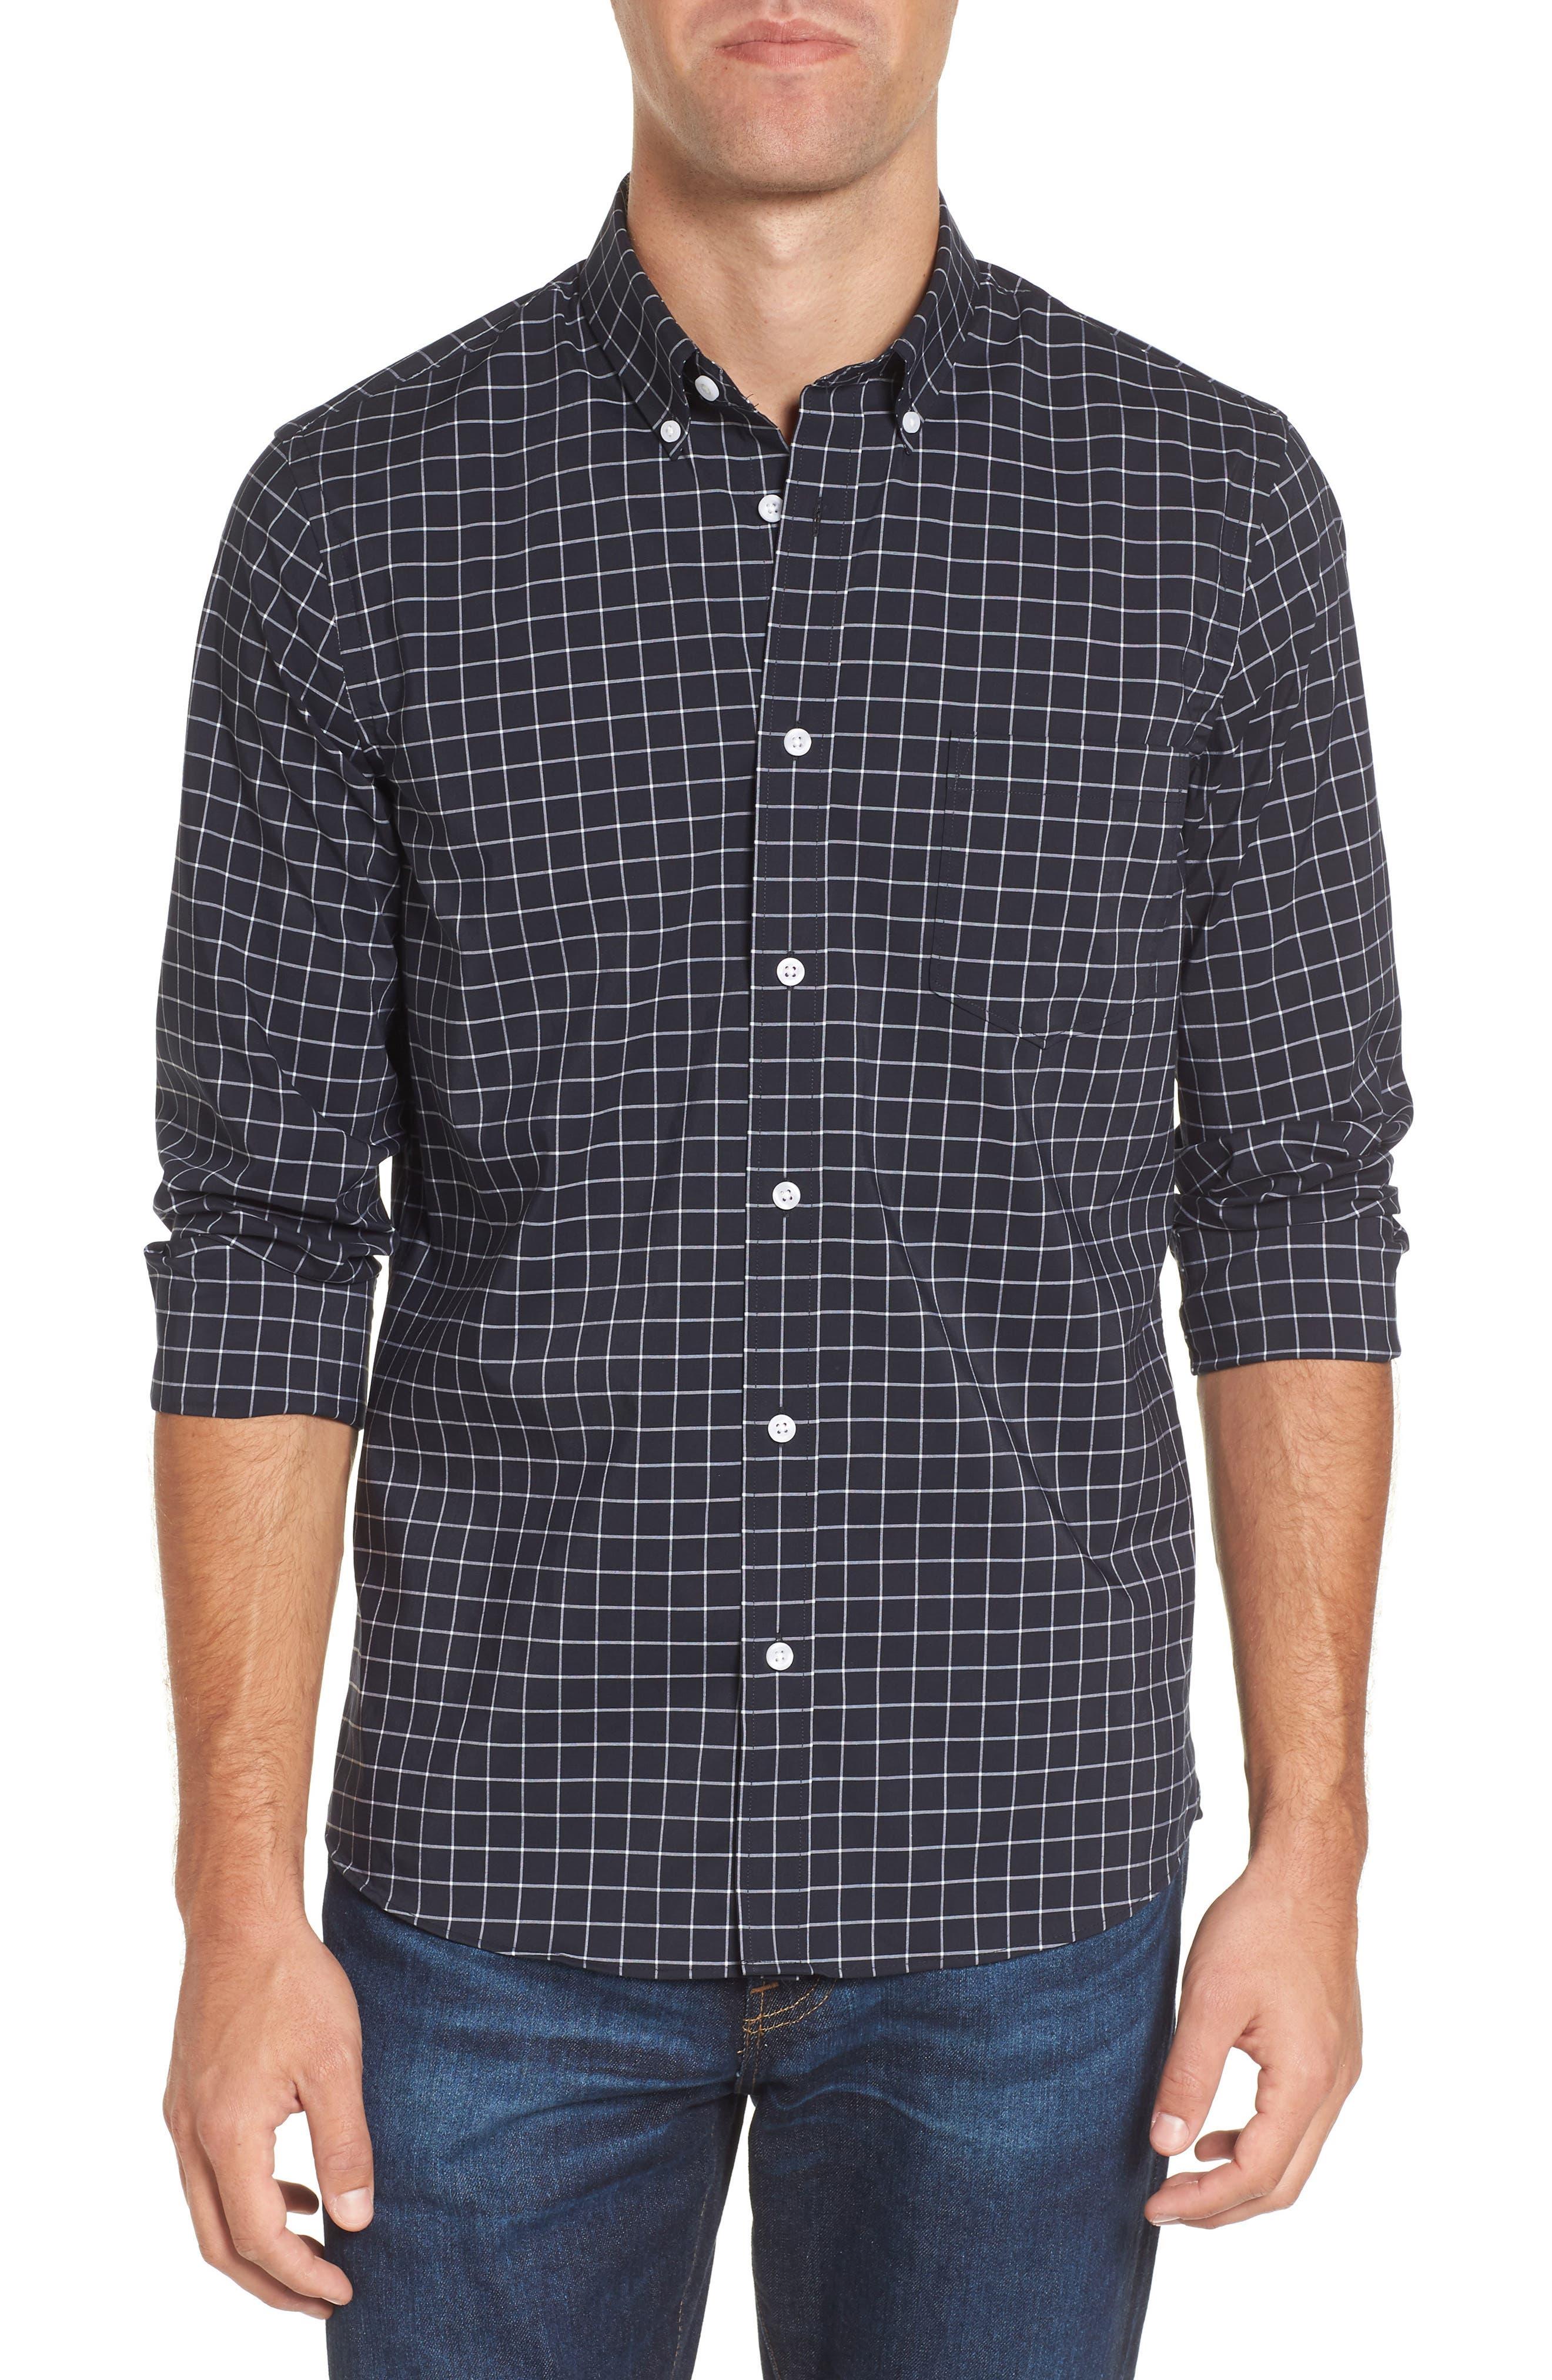 Nordstrom Men's Shop Slim Fit Tech Smart Grid Sport Shirt